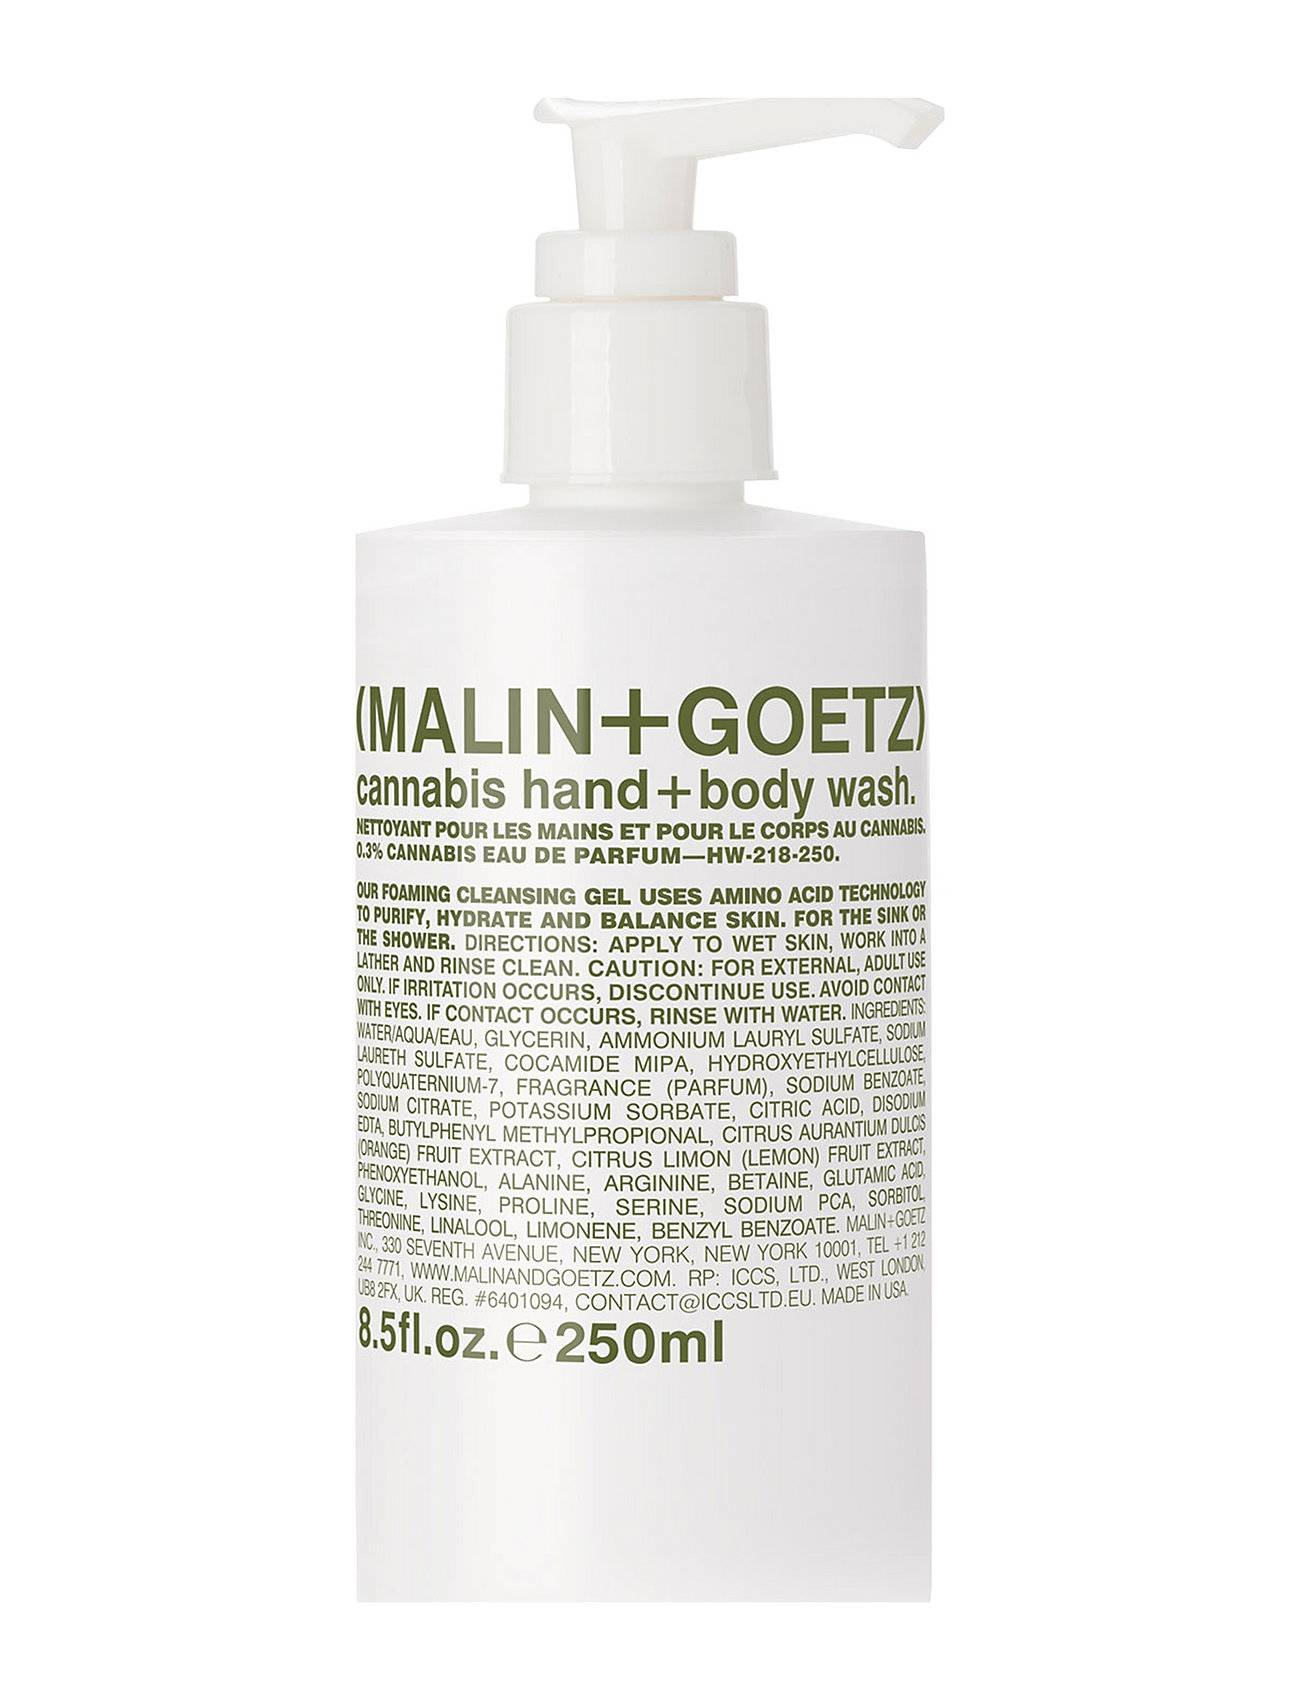 MALIN+GOETZ Cannabis Hand + Body Wash Suihkugeeli Nude MALIN+GOETZ